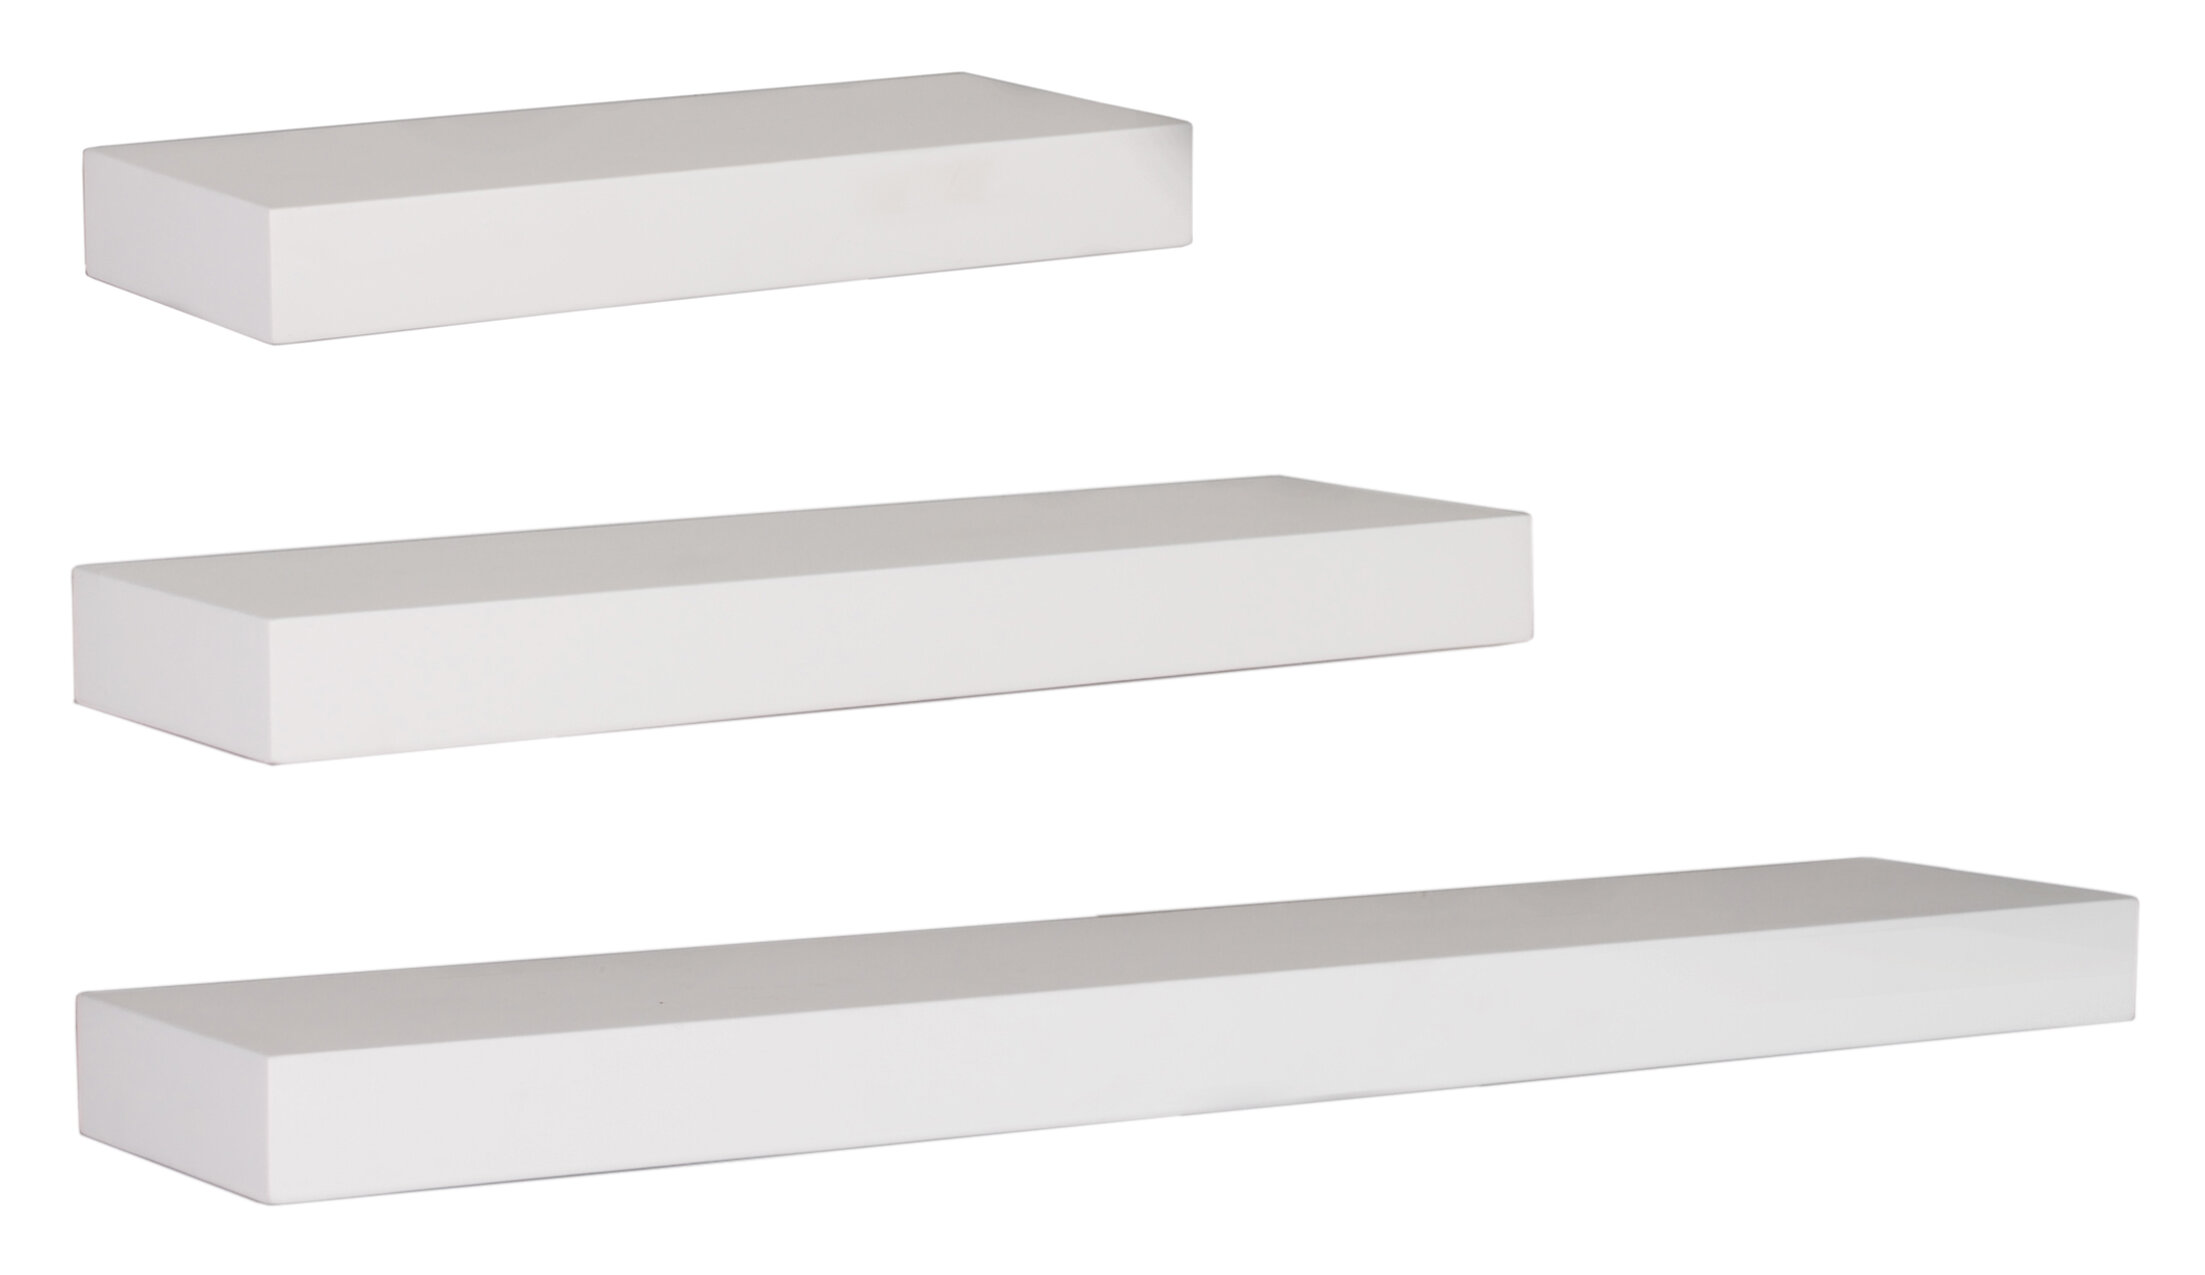 rectangle 3 piece floating shelf set mcrw2944